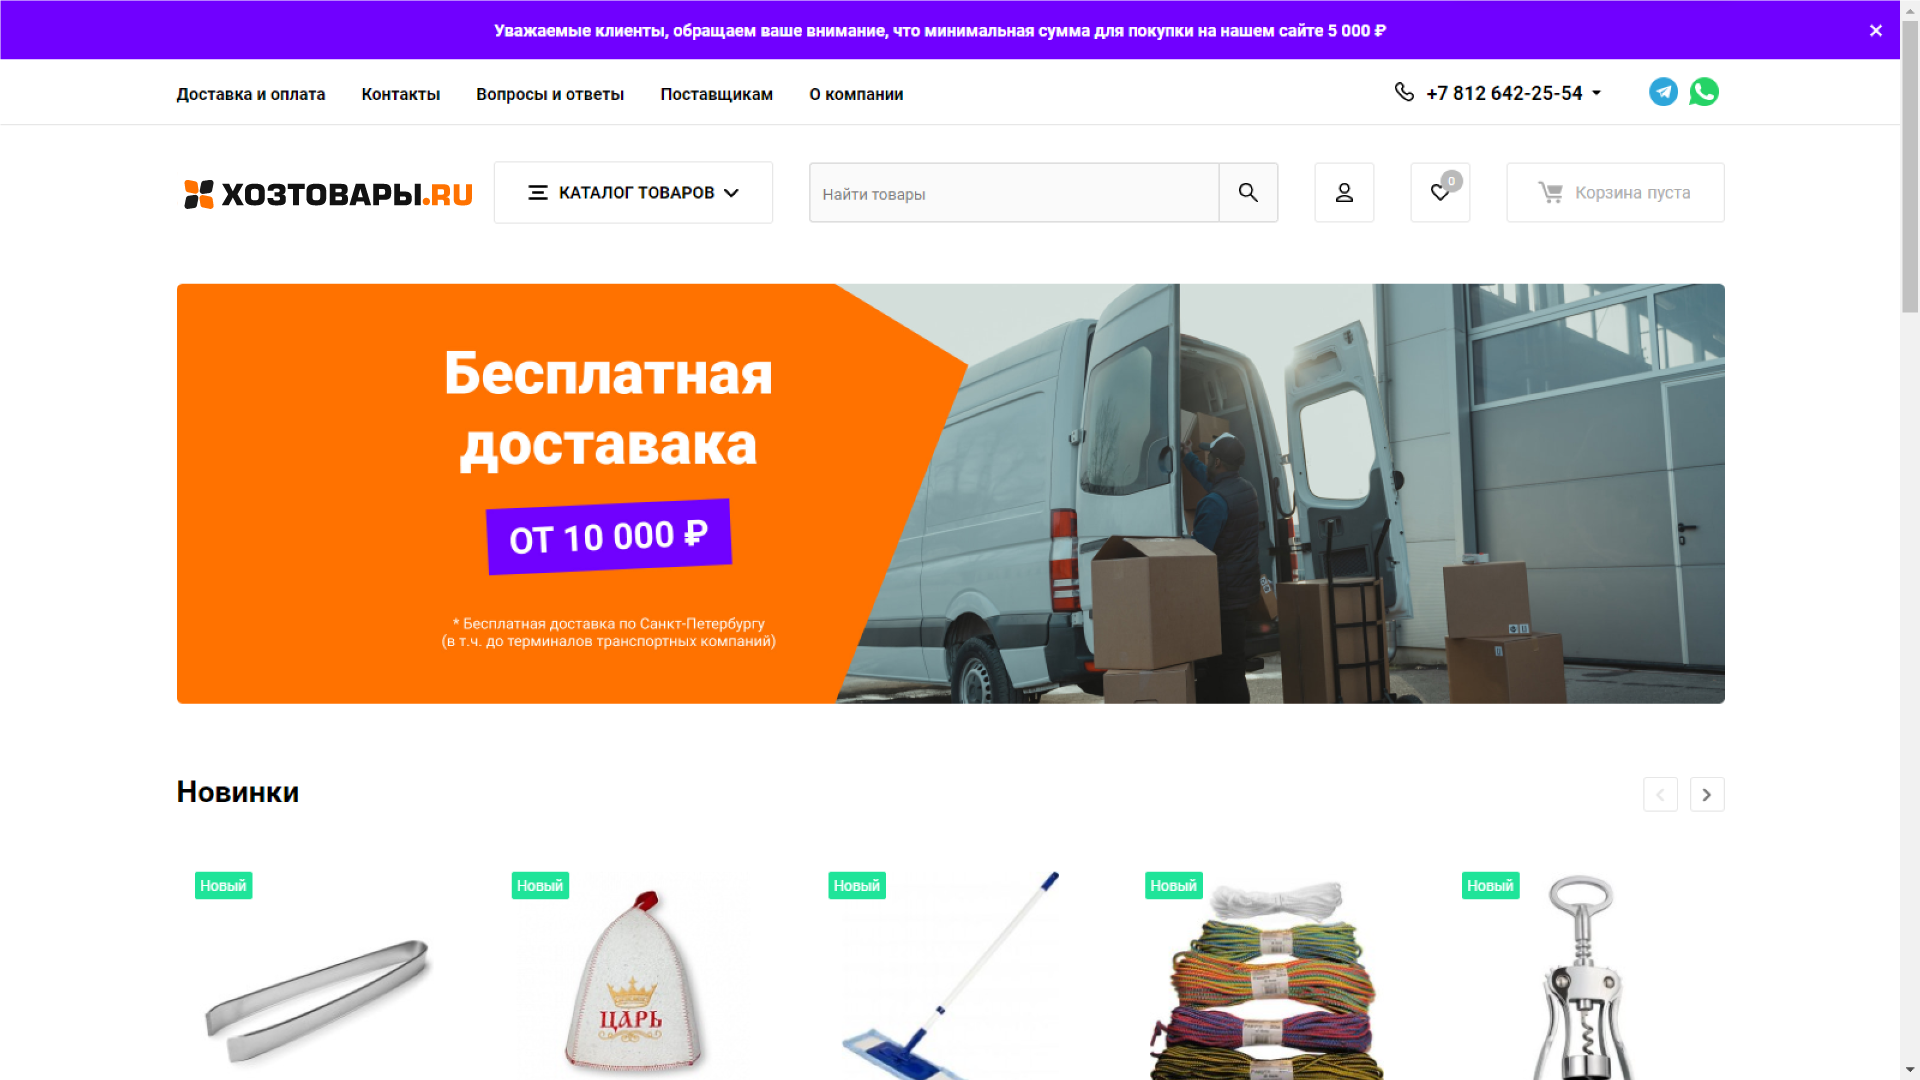 Разработка логотипа для оптового интернет-магазина «Хозтовары.ру» фото f_0626076e2568b47c.png